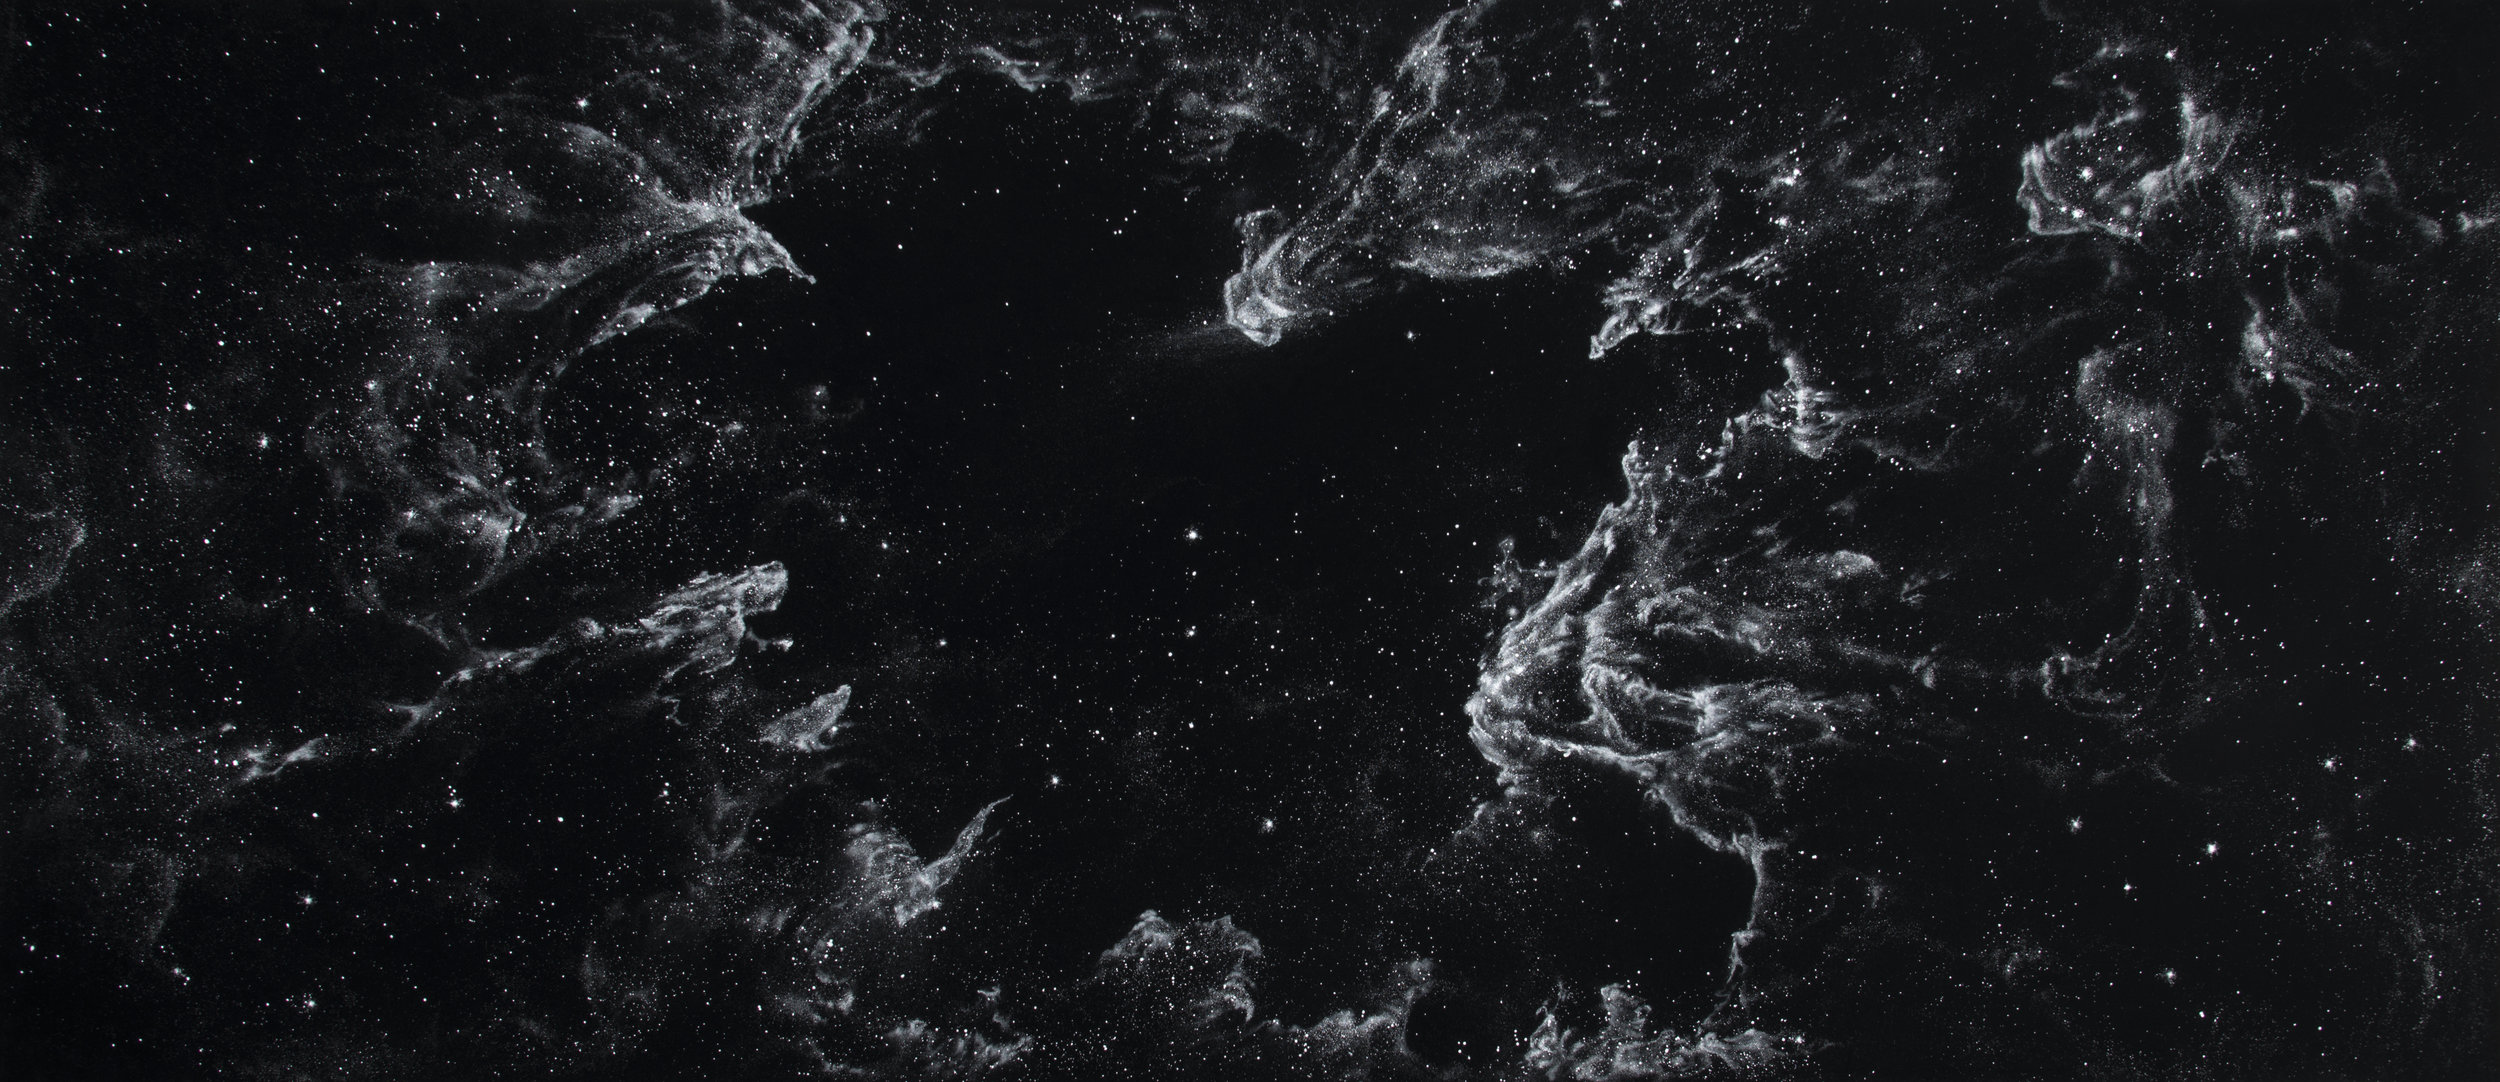 NGC 3372  2013  cocaine dust on photographer's velvet  52 x 120 ½ inches